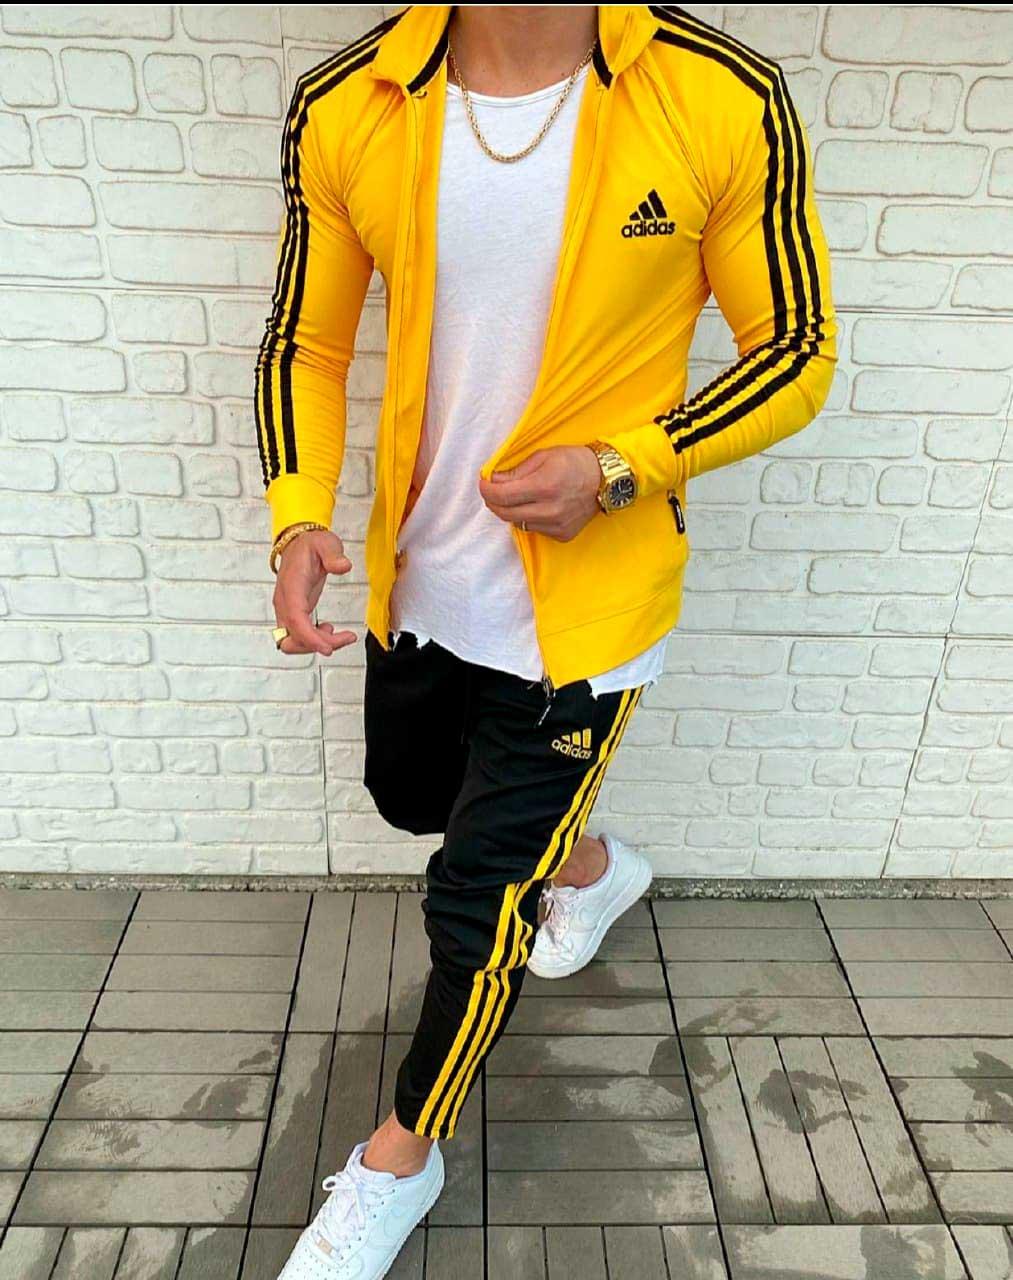 спортивный костюм адидас желтый